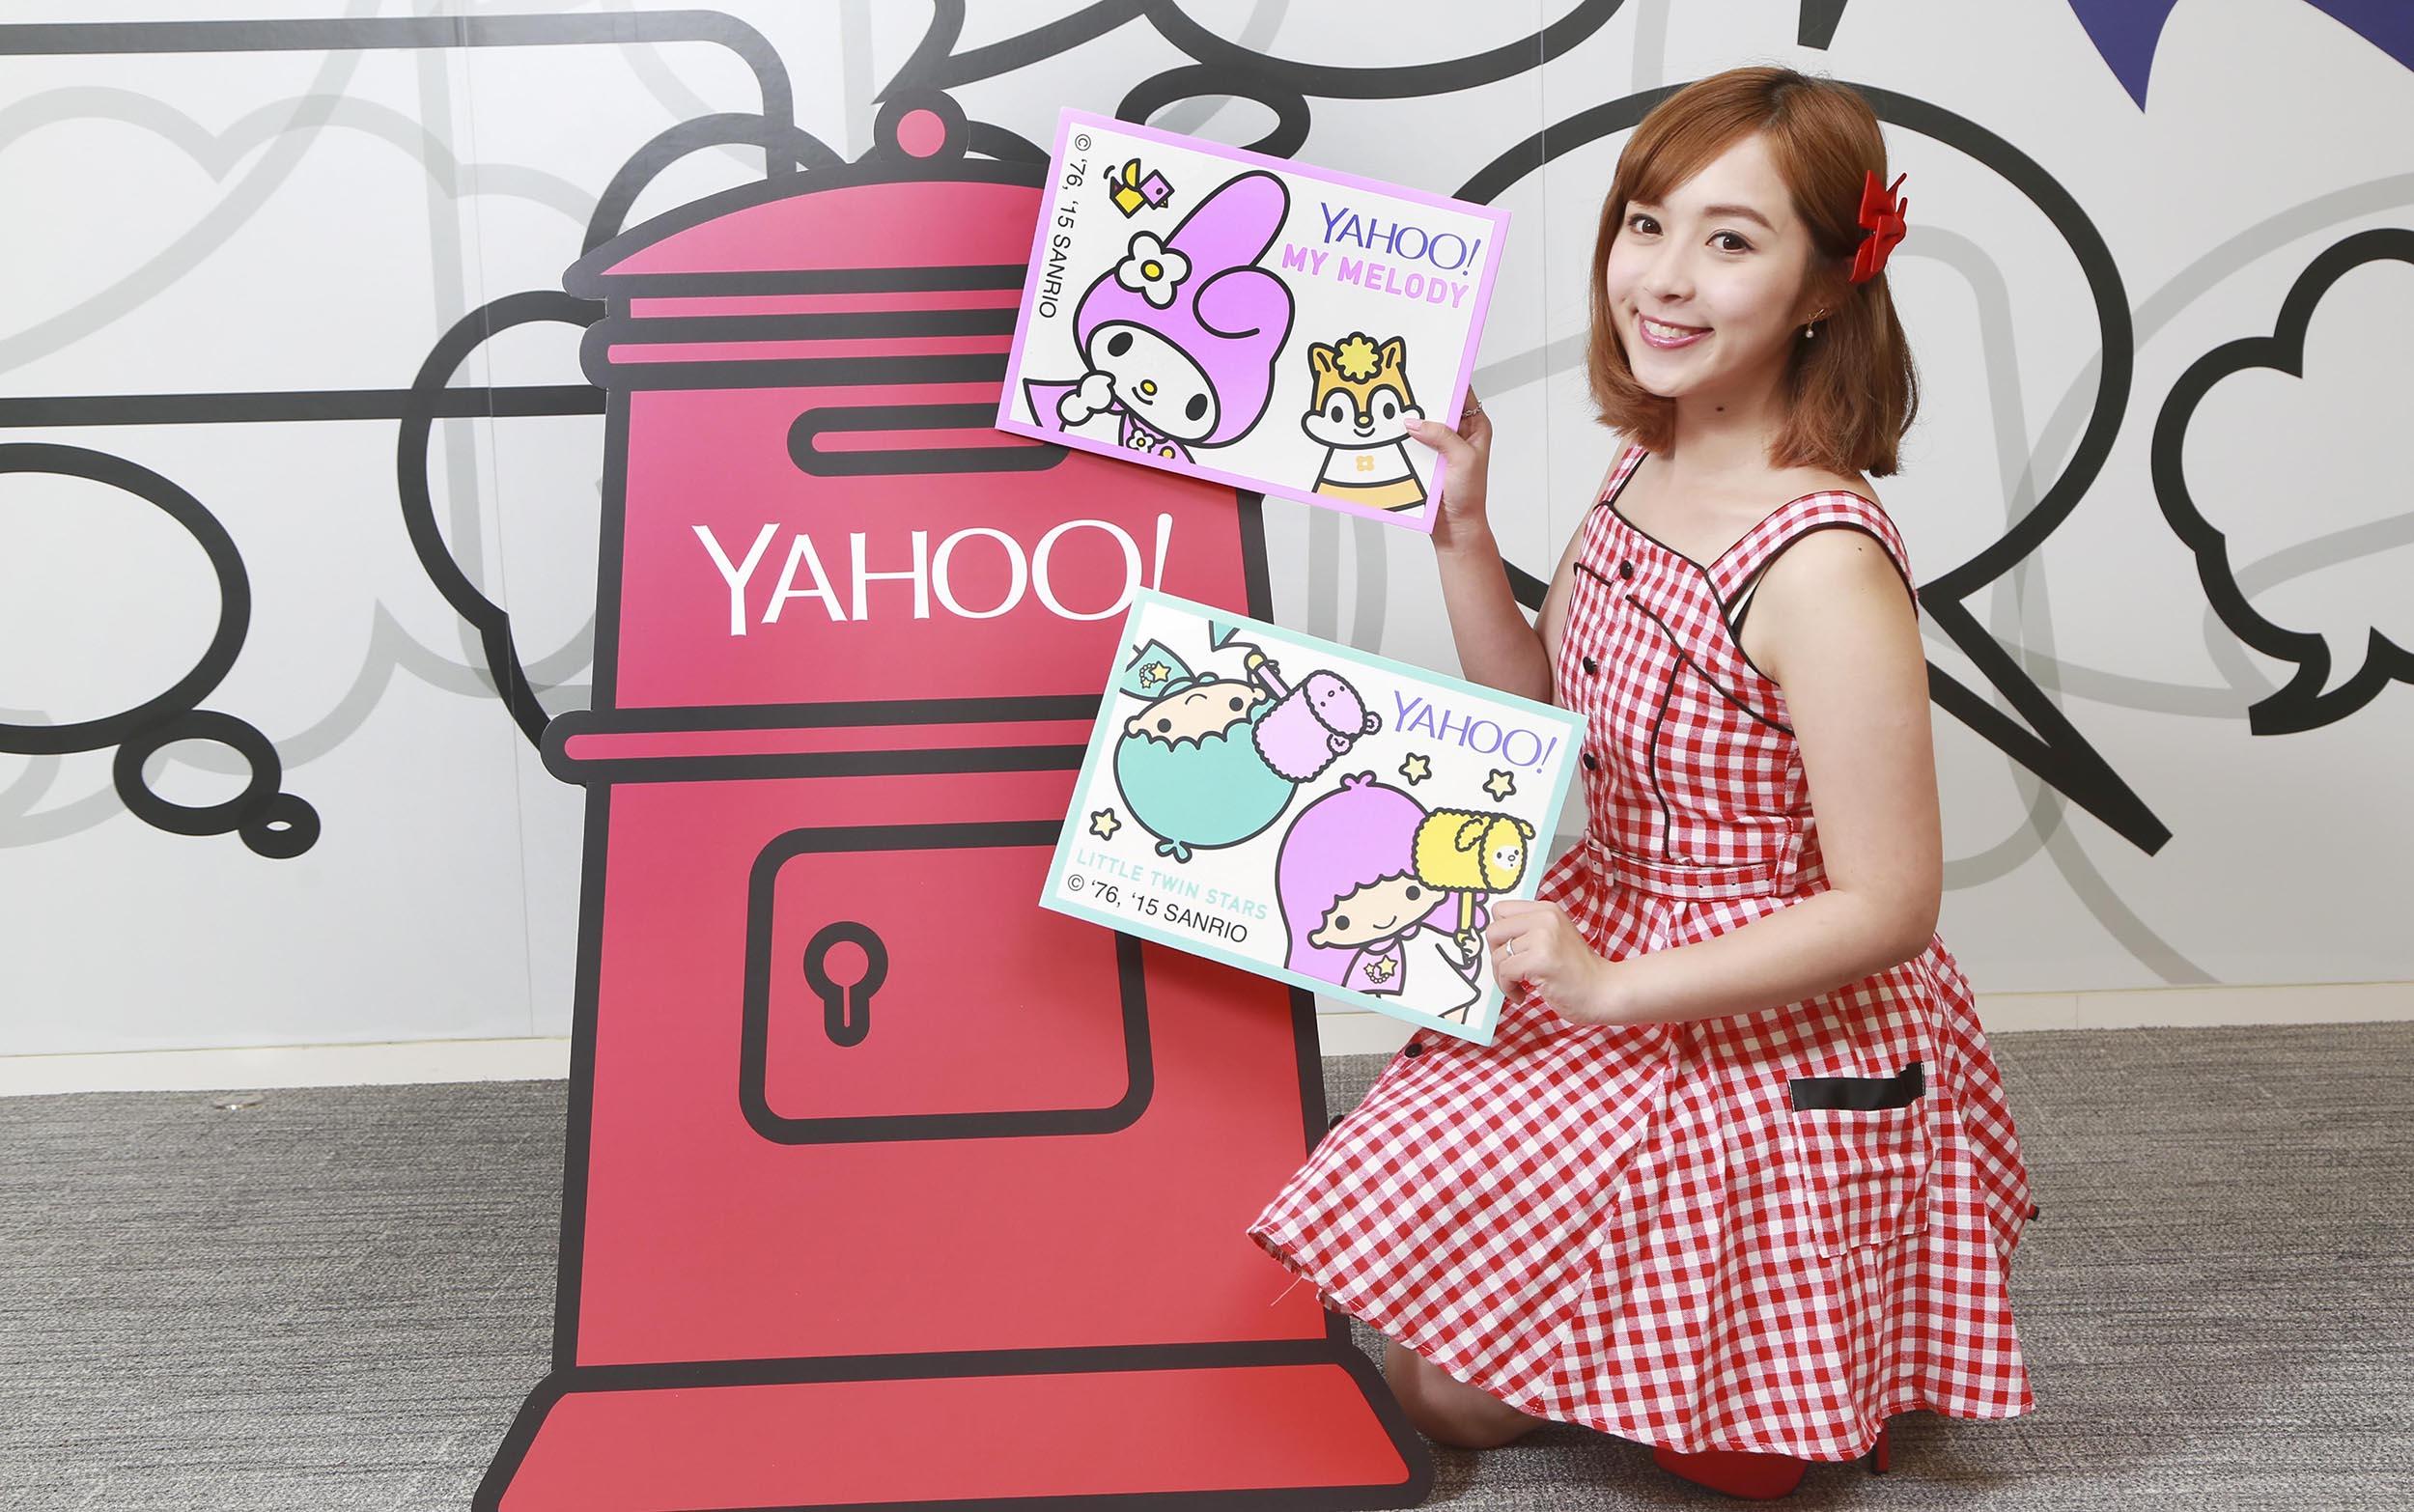 Yahoo 推 Sanrio 收藏版郵票  |男士必搶送禮之物